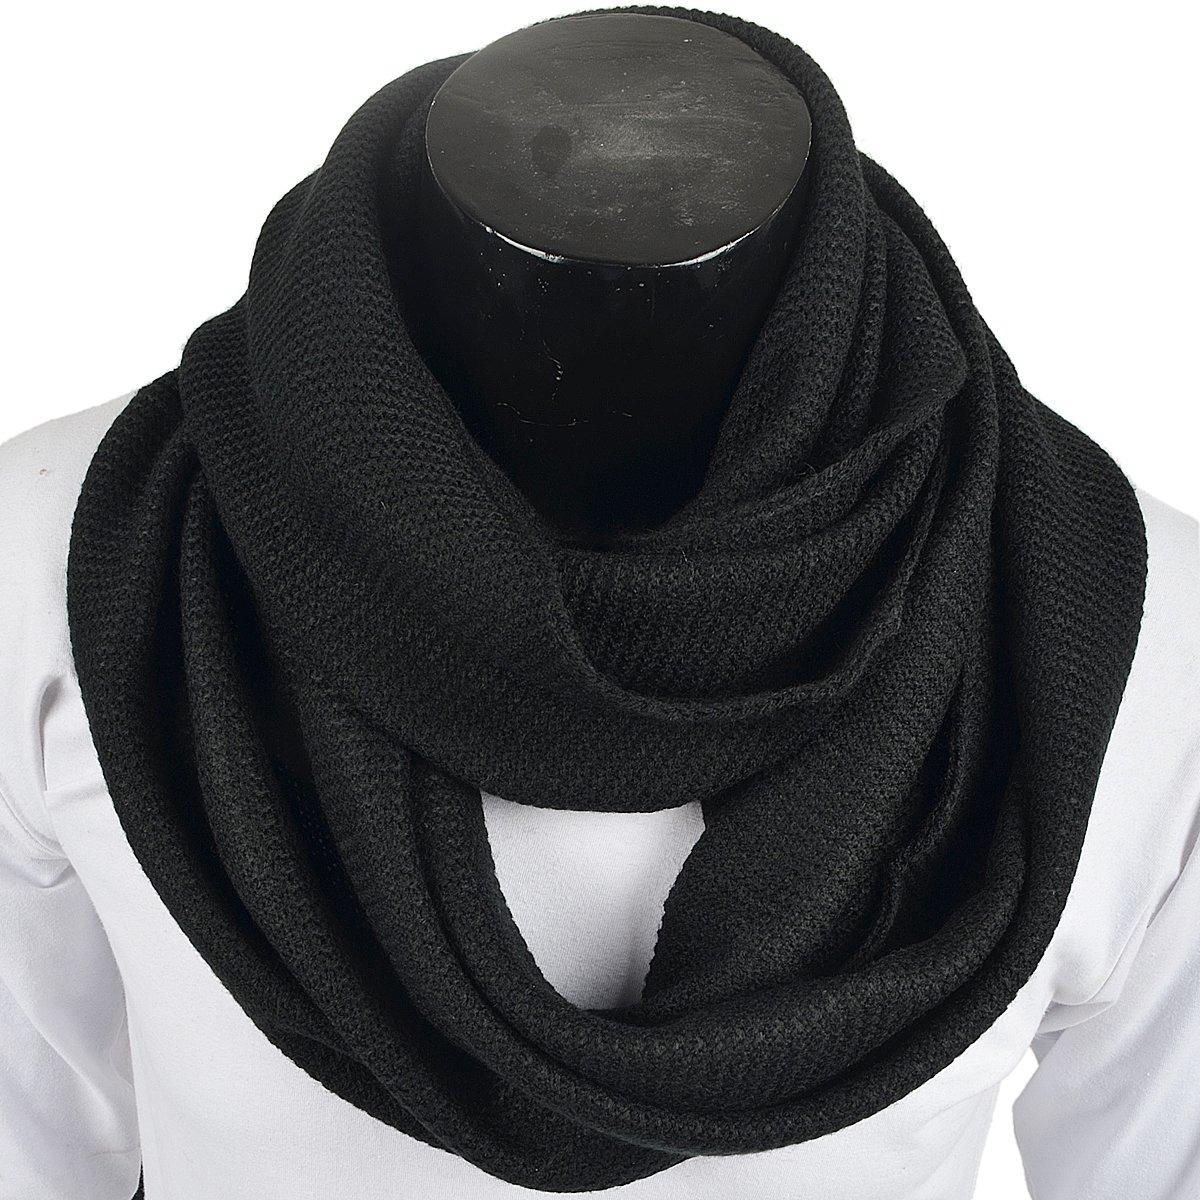 Men Scarf Knit Infinity Scarf Winter Soft Warm Scarves (Black)